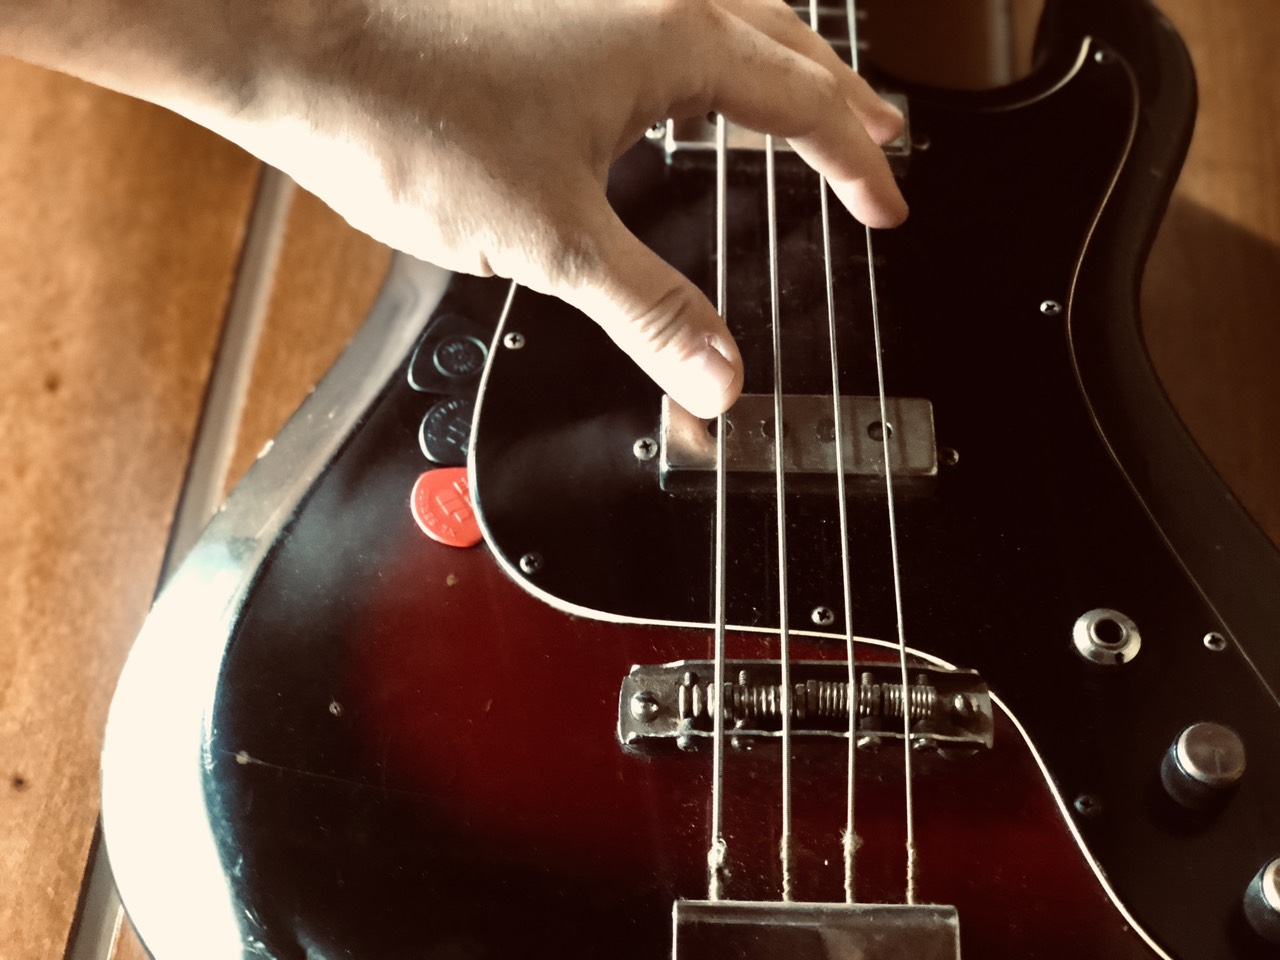 Bas gitara, ilustracija, foto: M.M.